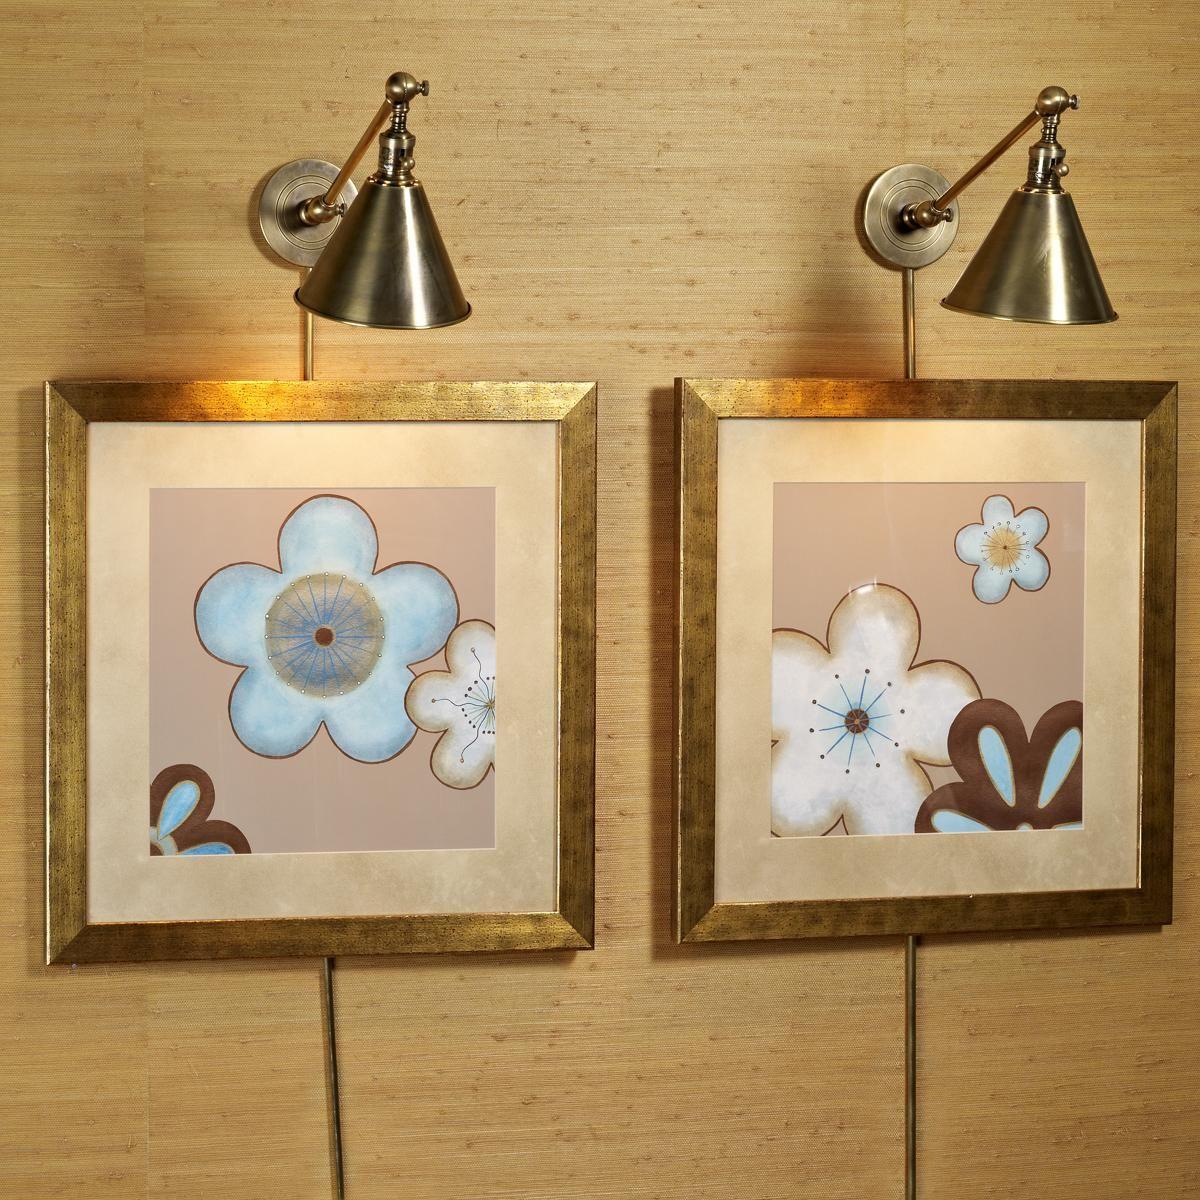 Cone Pivot Shade Wall Lamp Decor Ideas Painting Lamp